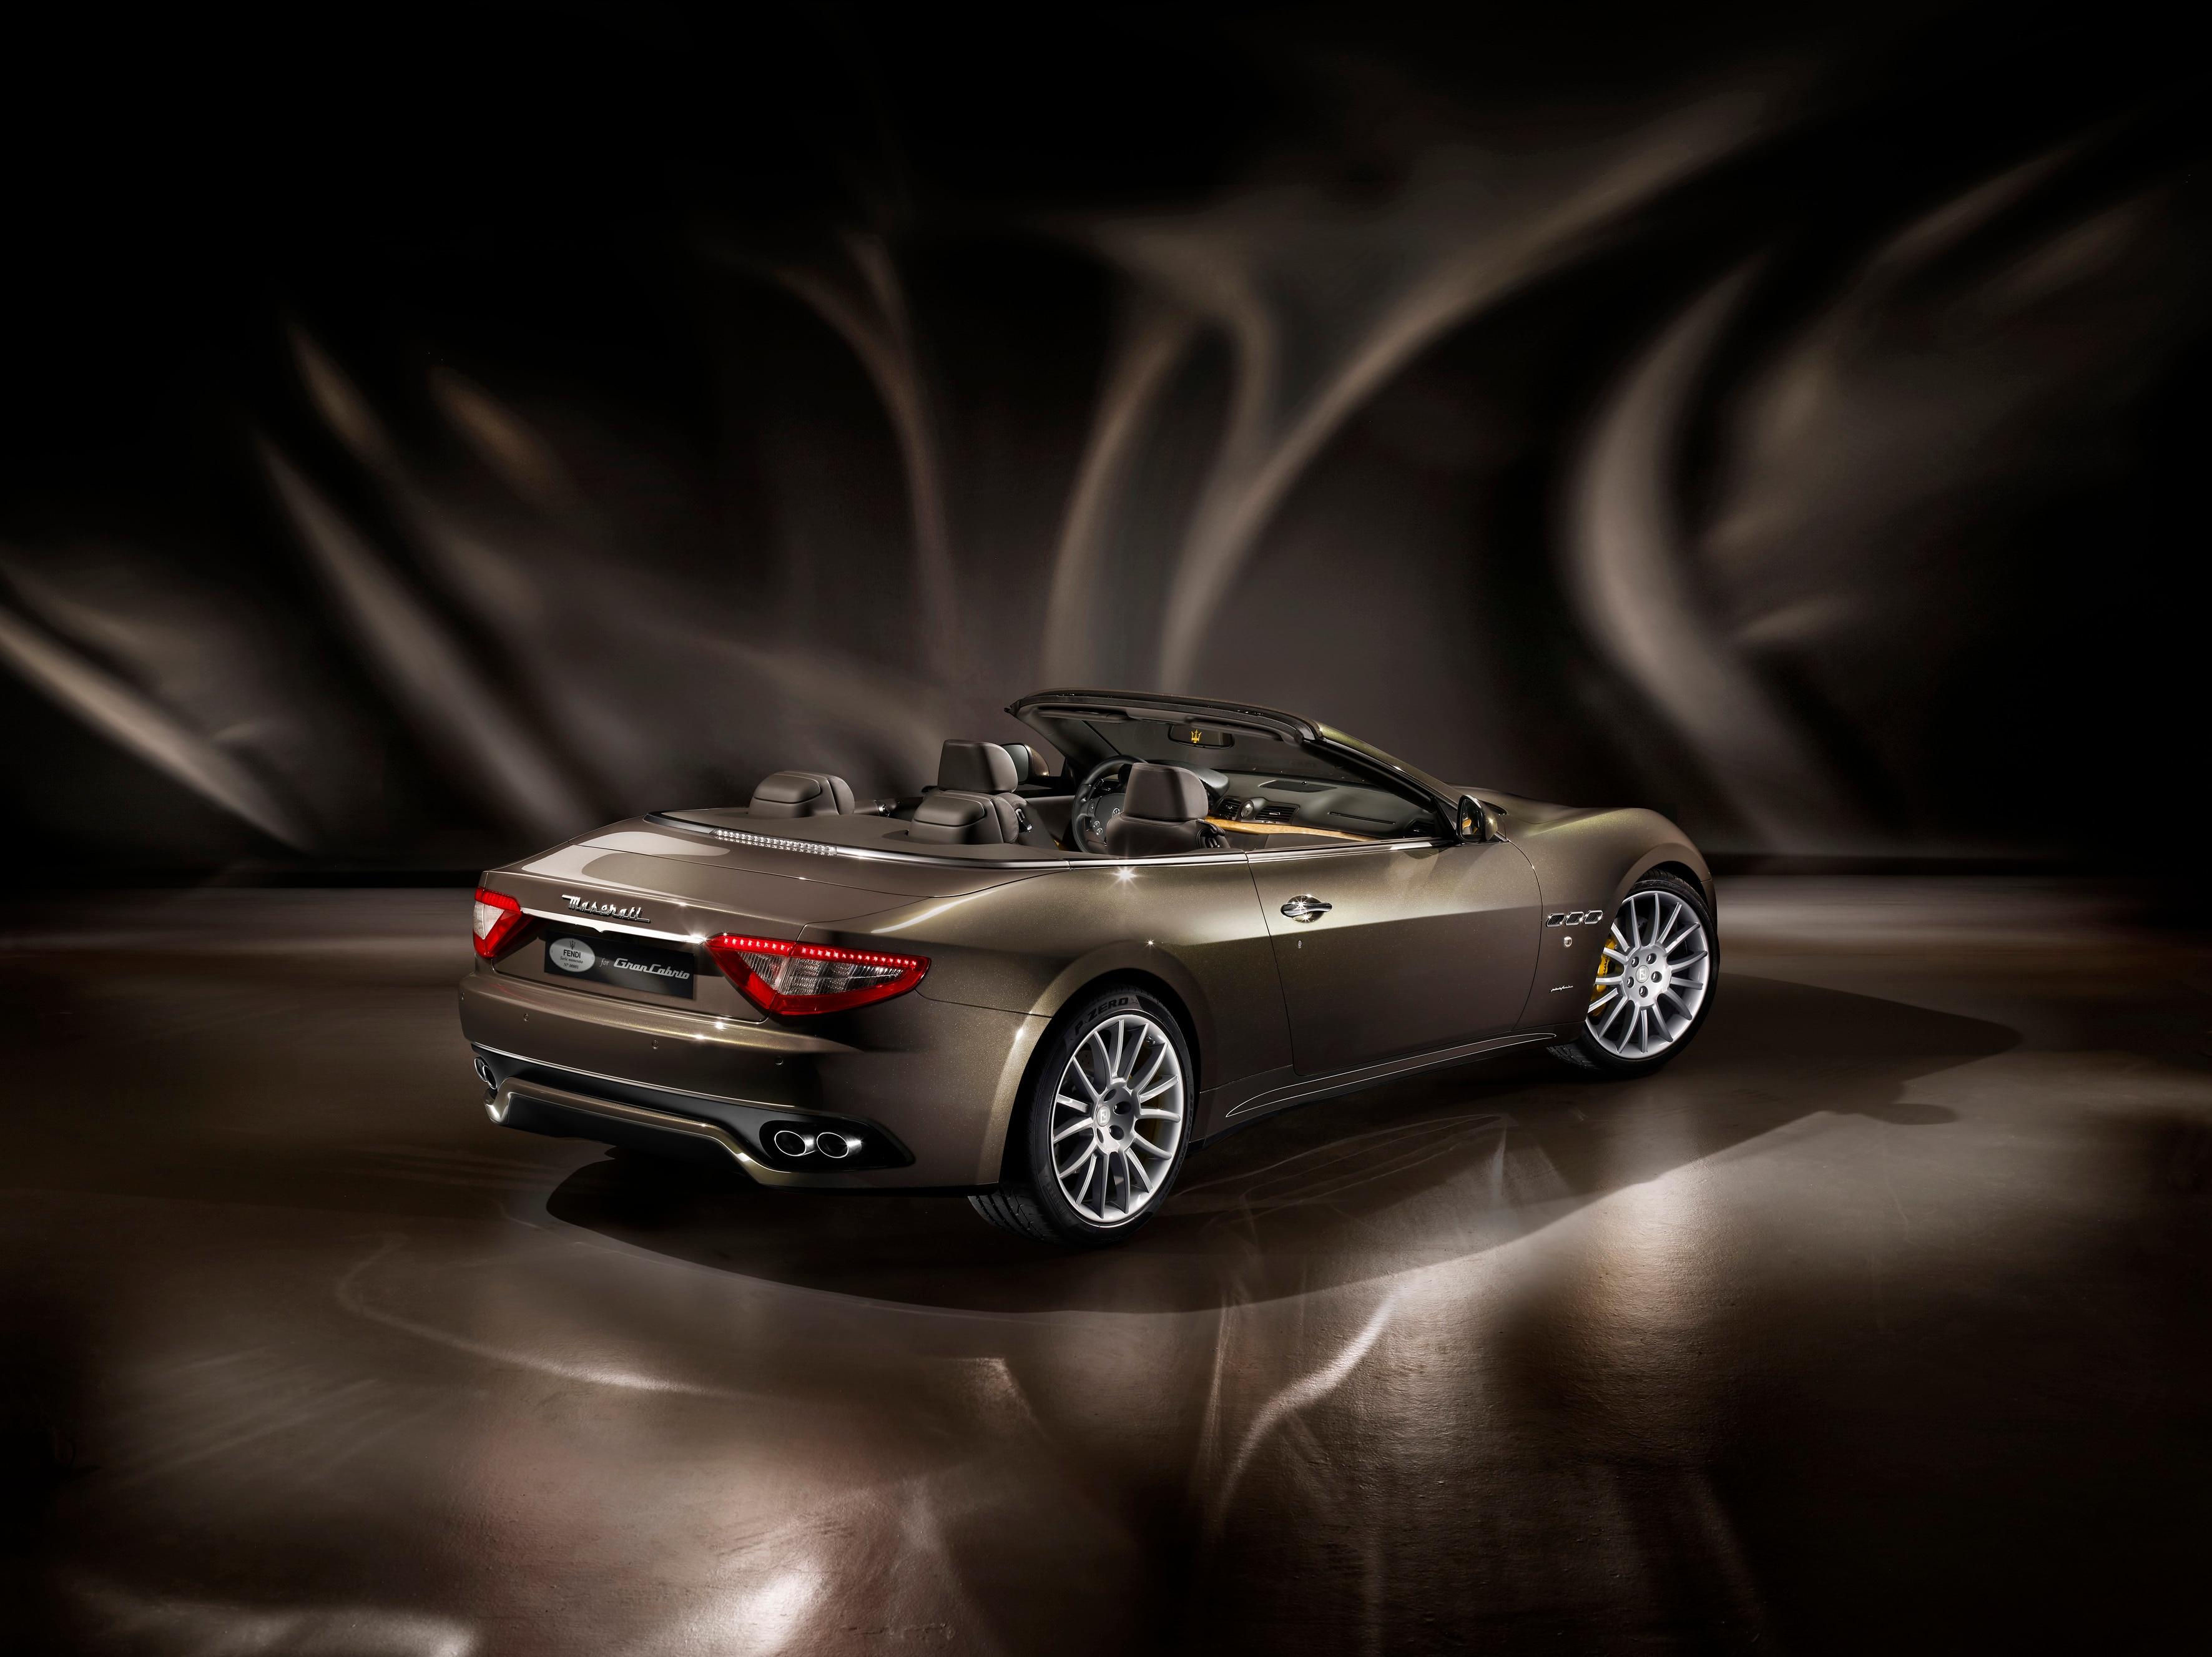 http://st.automobilemag.com/uploads/sites/11/2011/08/2012-Maserati-GranCabrio-Fendi-rear-three-quarters.jpg